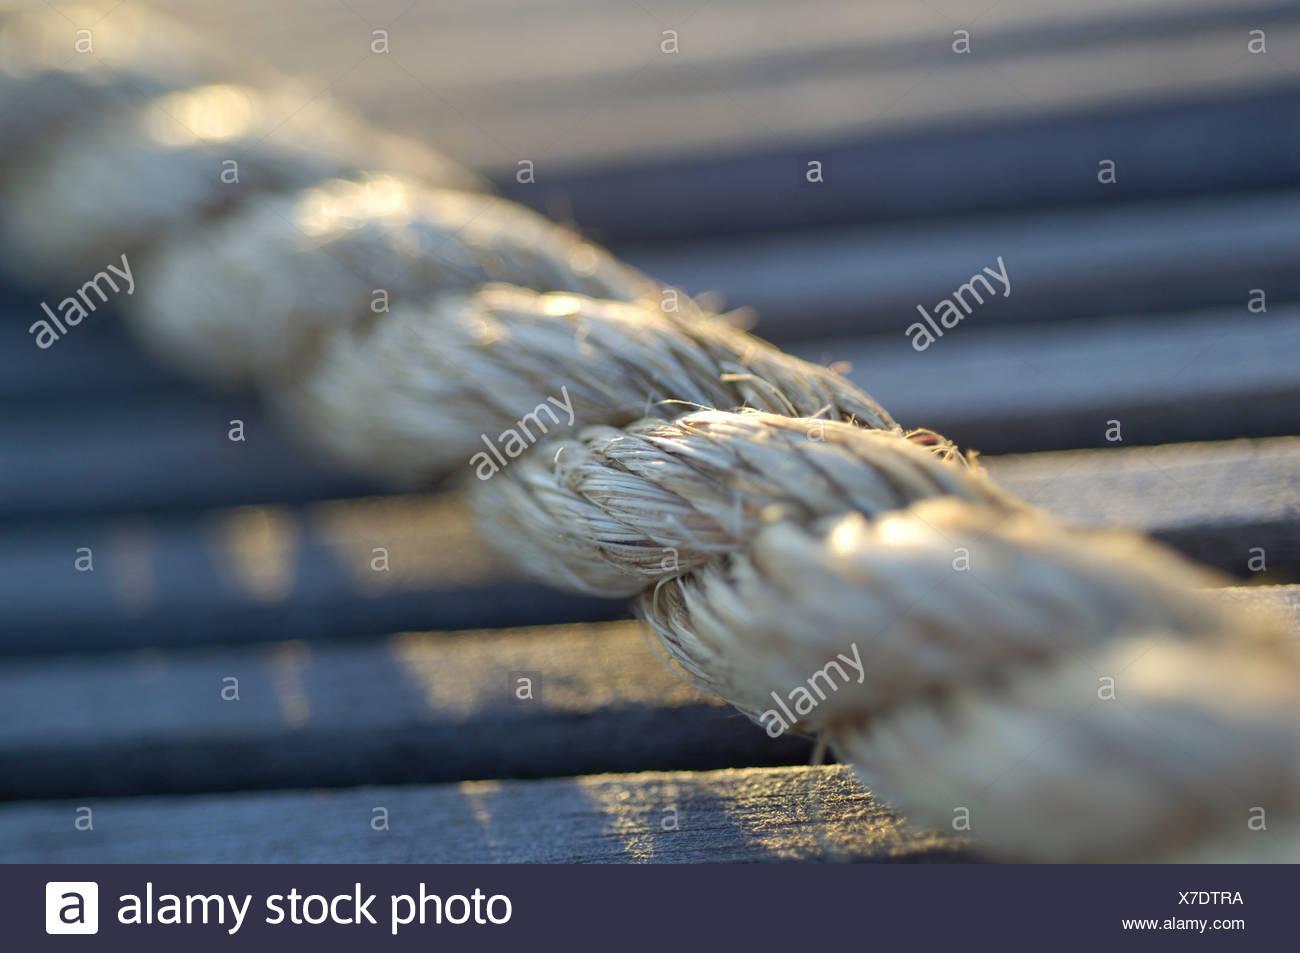 Sailing rope, close-up - Stock Image